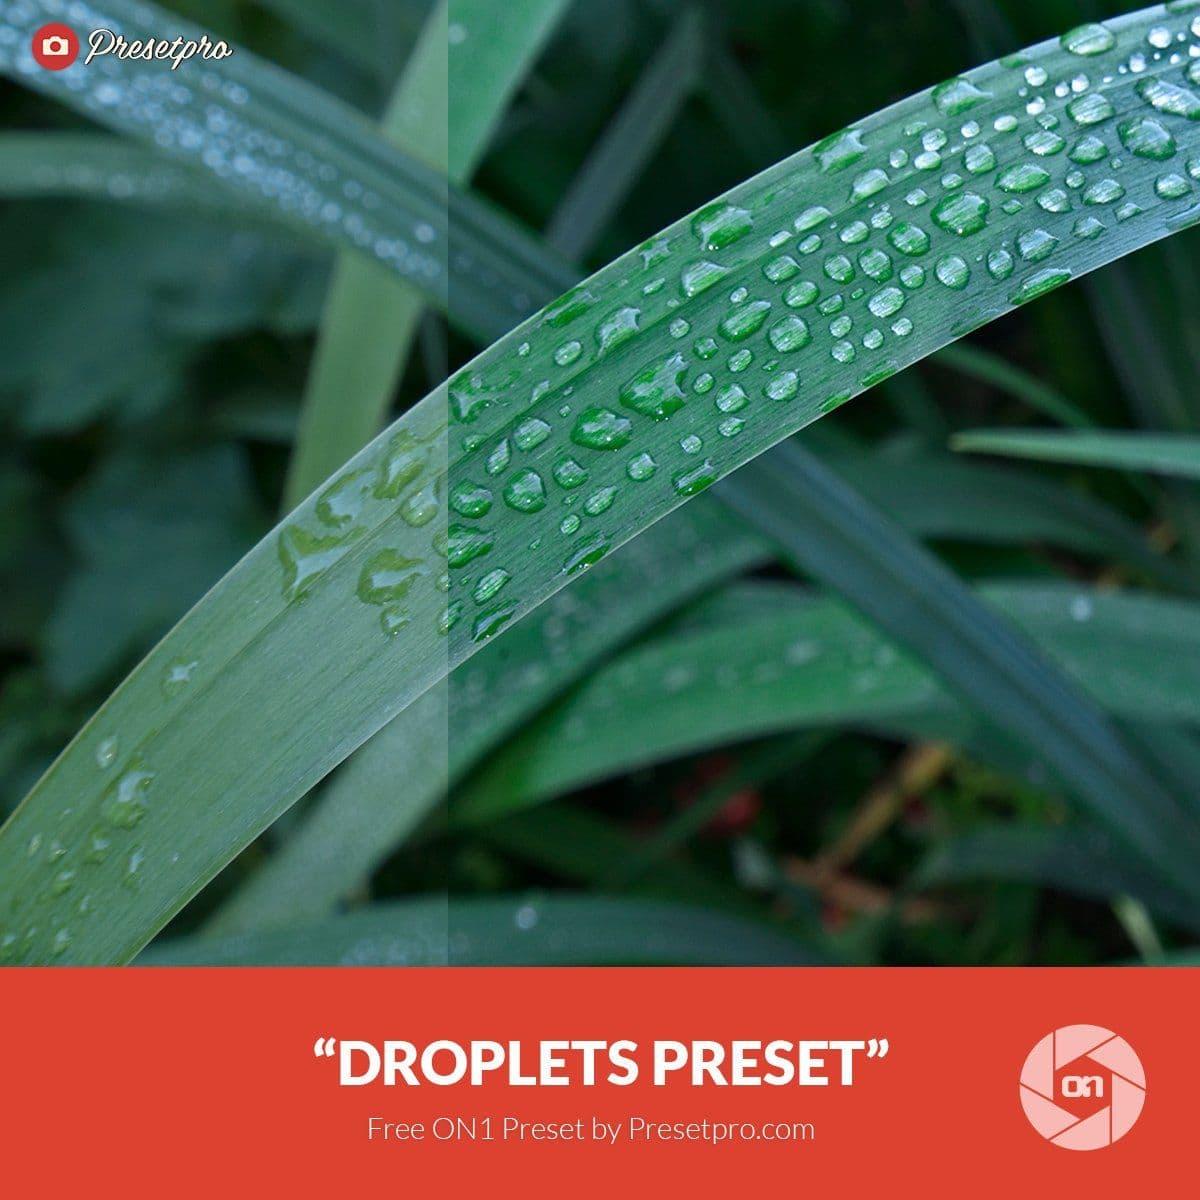 Free-On1-Preset-Droplets-Presetpro.com